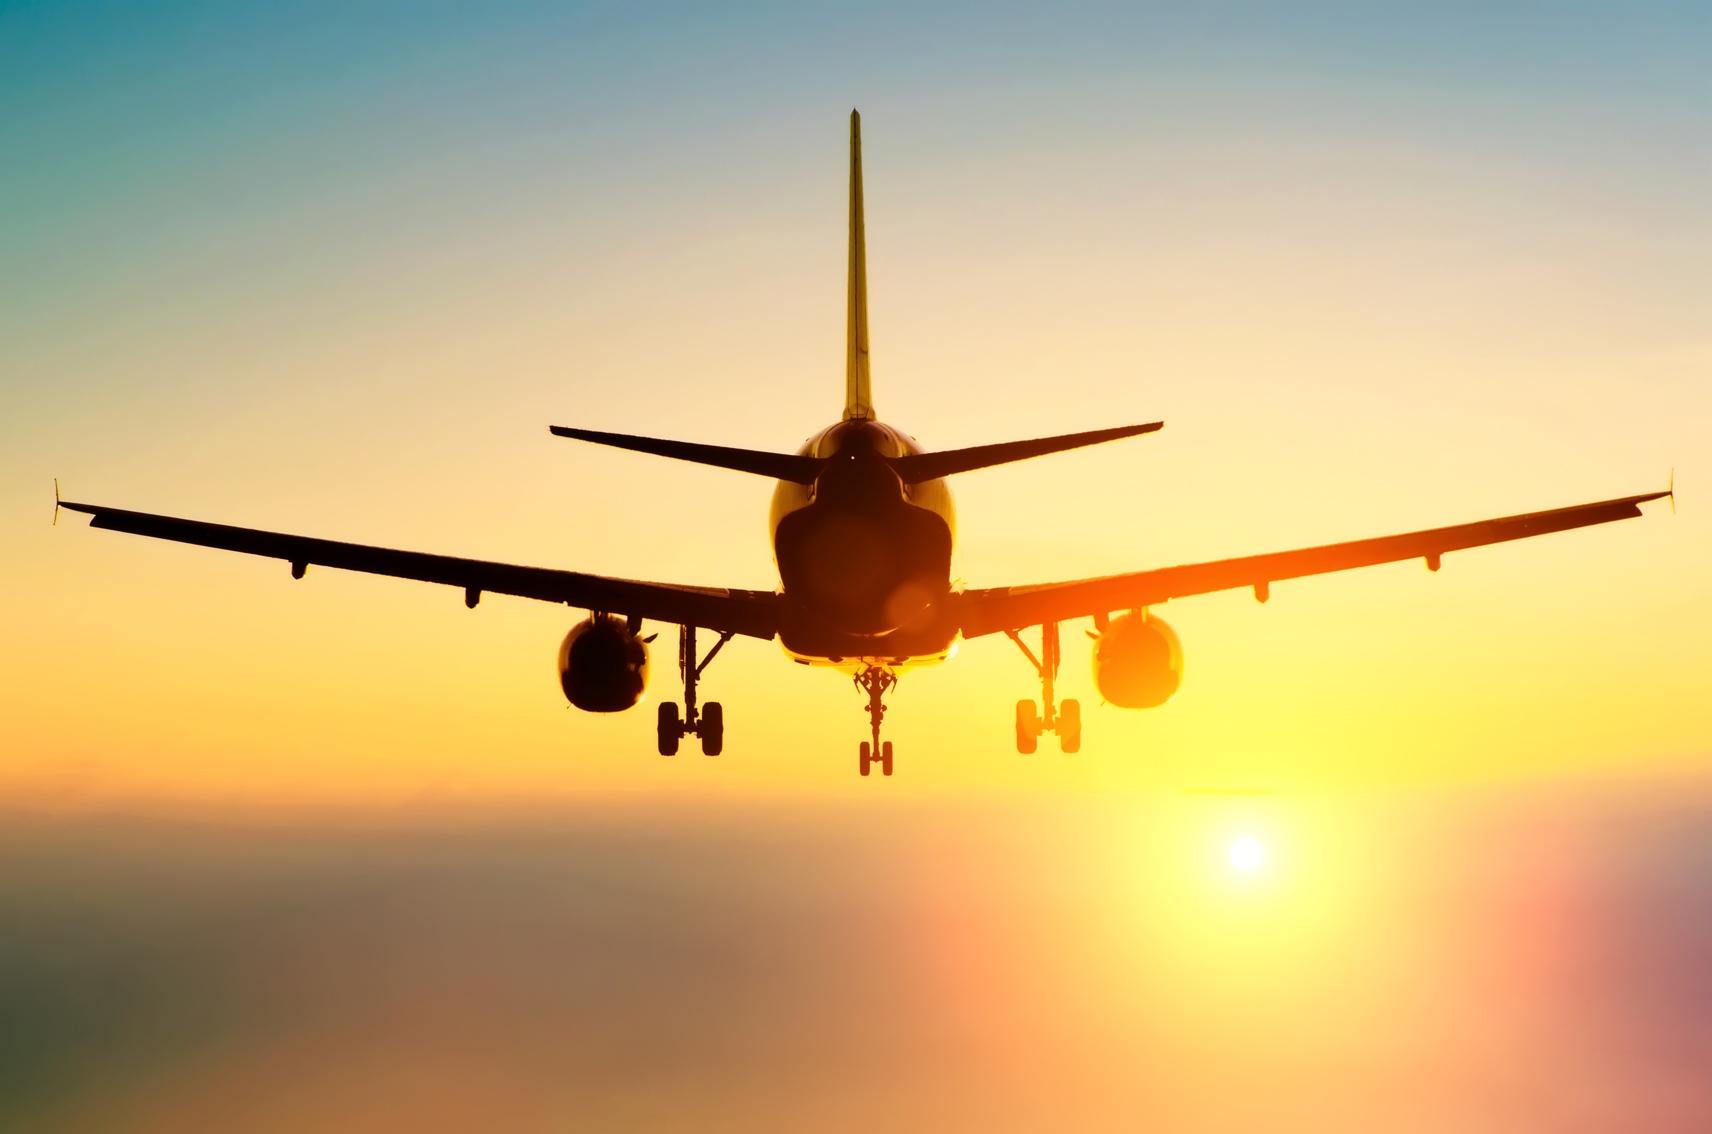 Airline Stocks, Airport, Air Travel Stocks, Travel Stocks